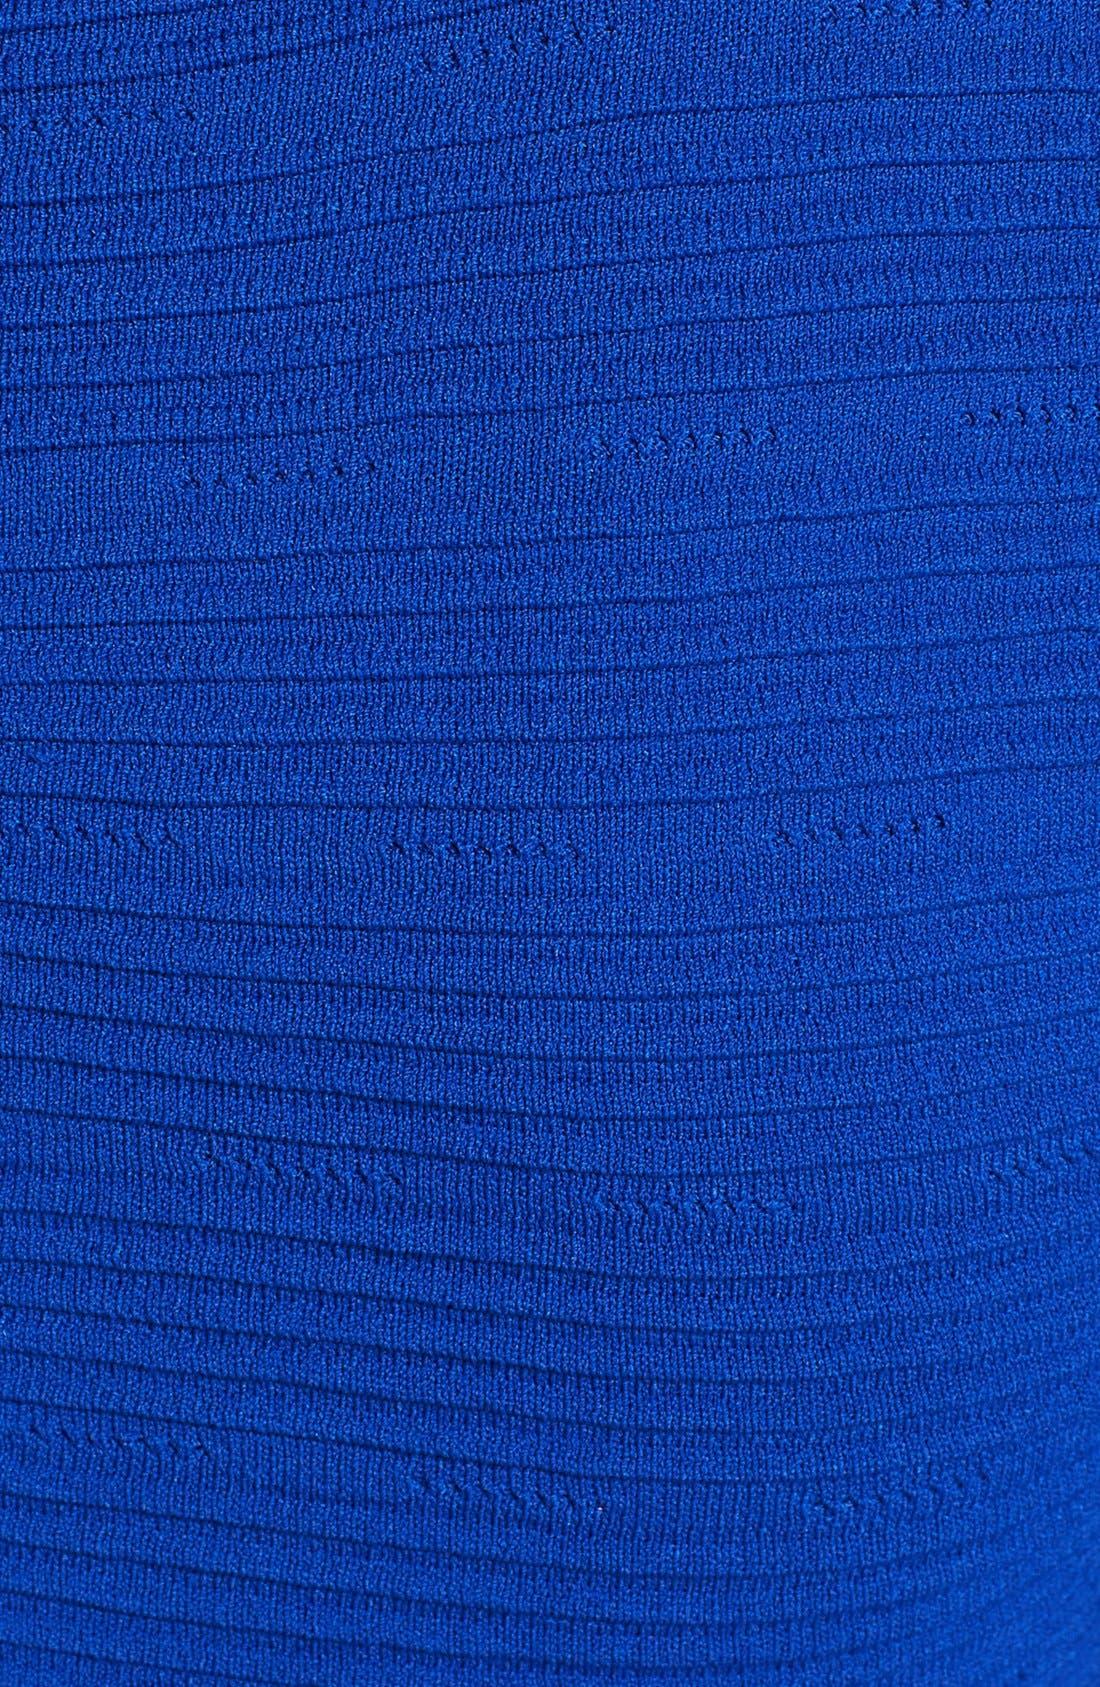 Alternate Image 3  - Felicity & Coco Knit Body-Con Midi Dress (Nordstrom Exclusive)